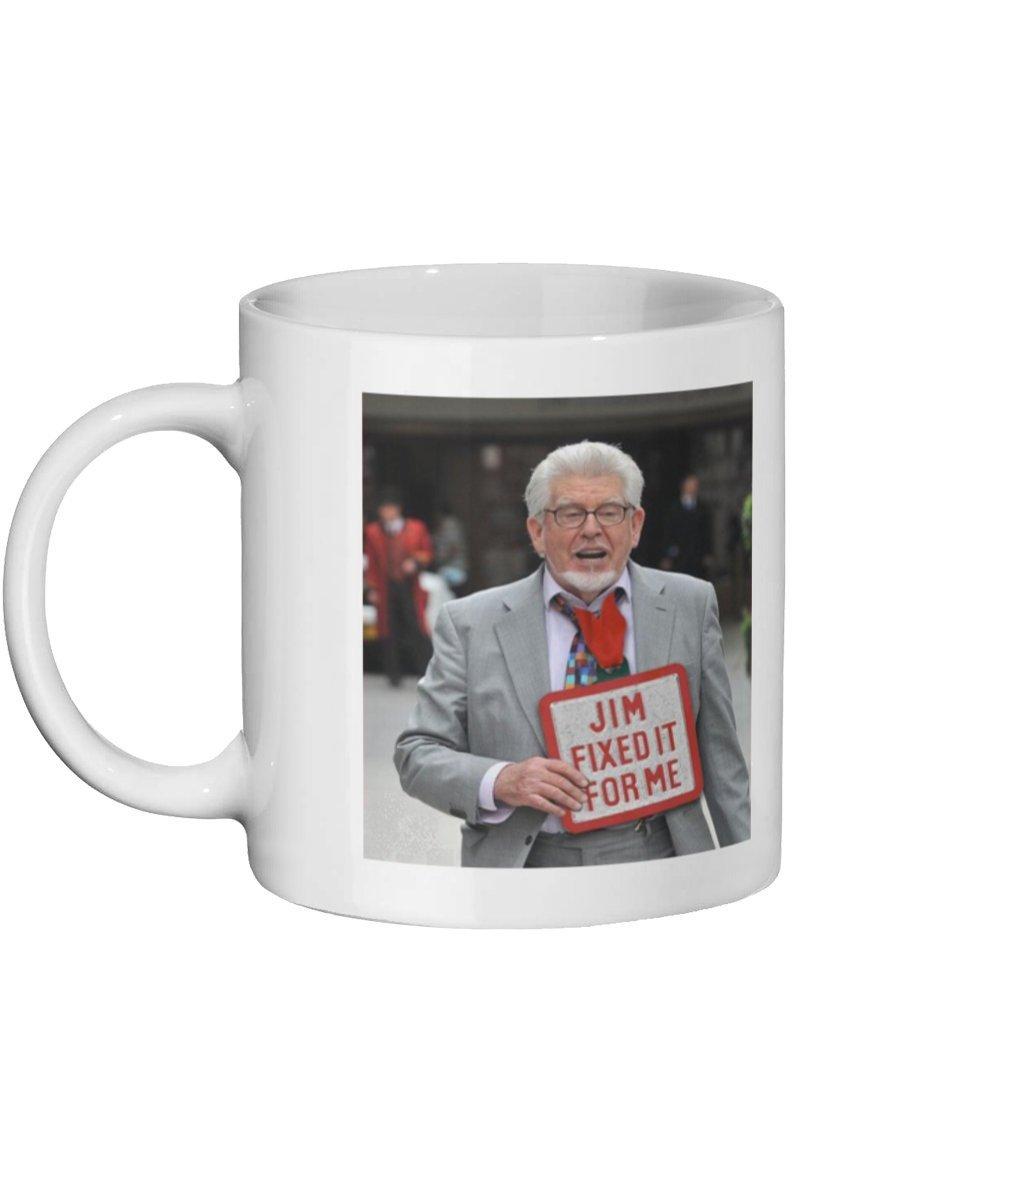 Rolf Harris Fix It RUDE offensive Paedo Ceramic Mug 11oz #rudegift #peedo #rolfharris #jimmysavile #offensivegift #offensive #funnyaf #funnyasfuck #offensivememe #snowflake #buttfucked #lol #peedopaedo #jimllfixit #offensivemug https://etsy.me/3gubffCpic.twitter.com/2RRAdf5way